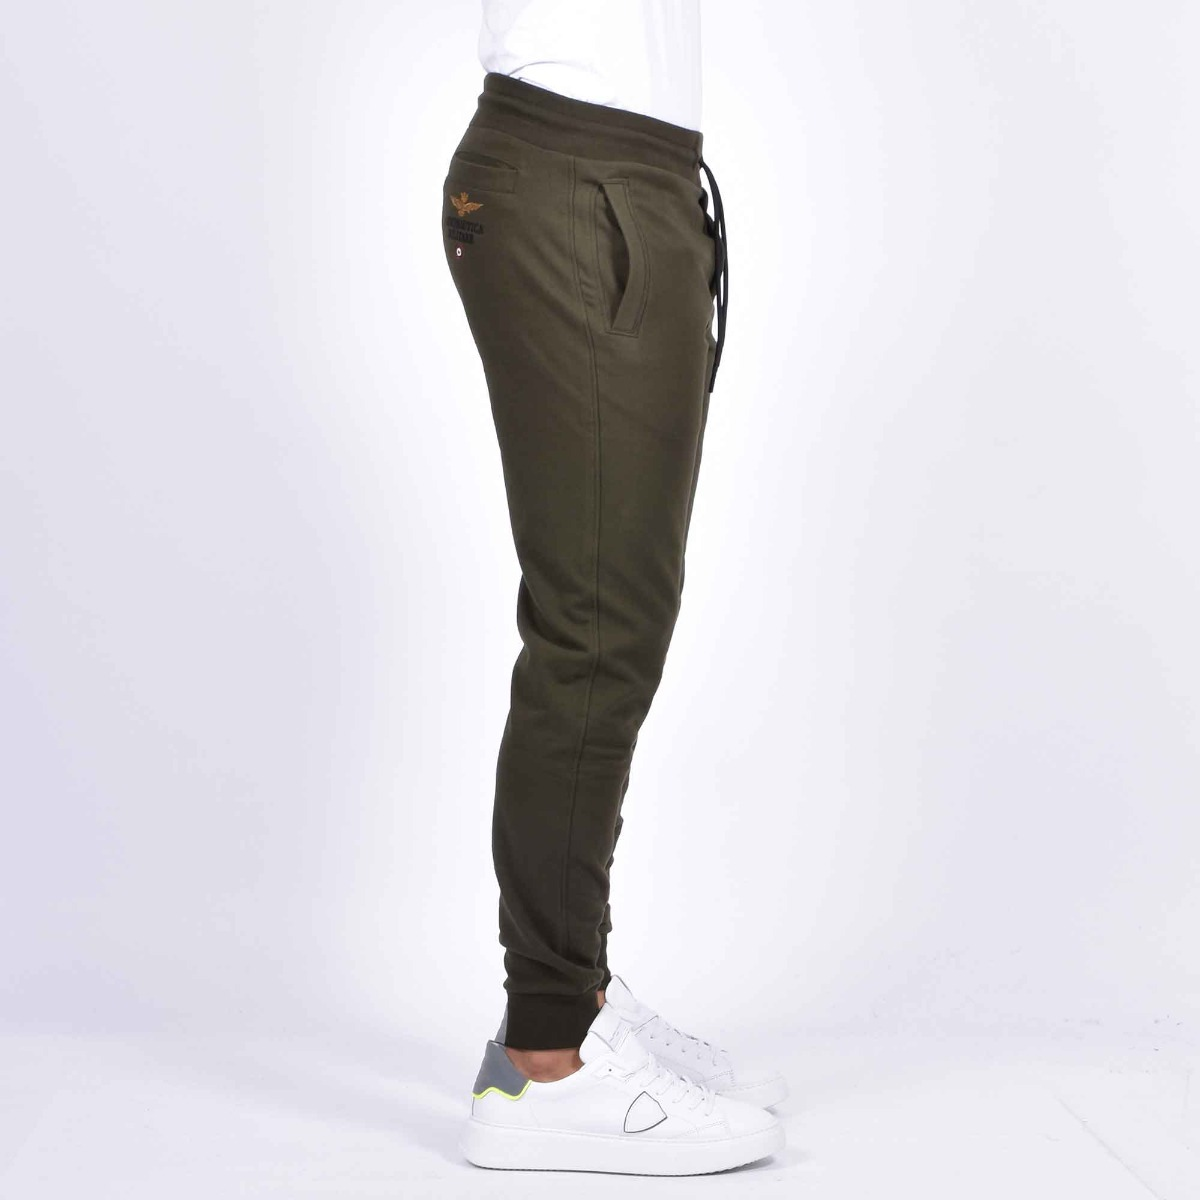 Pantalone felpa aquila - Verde scuro